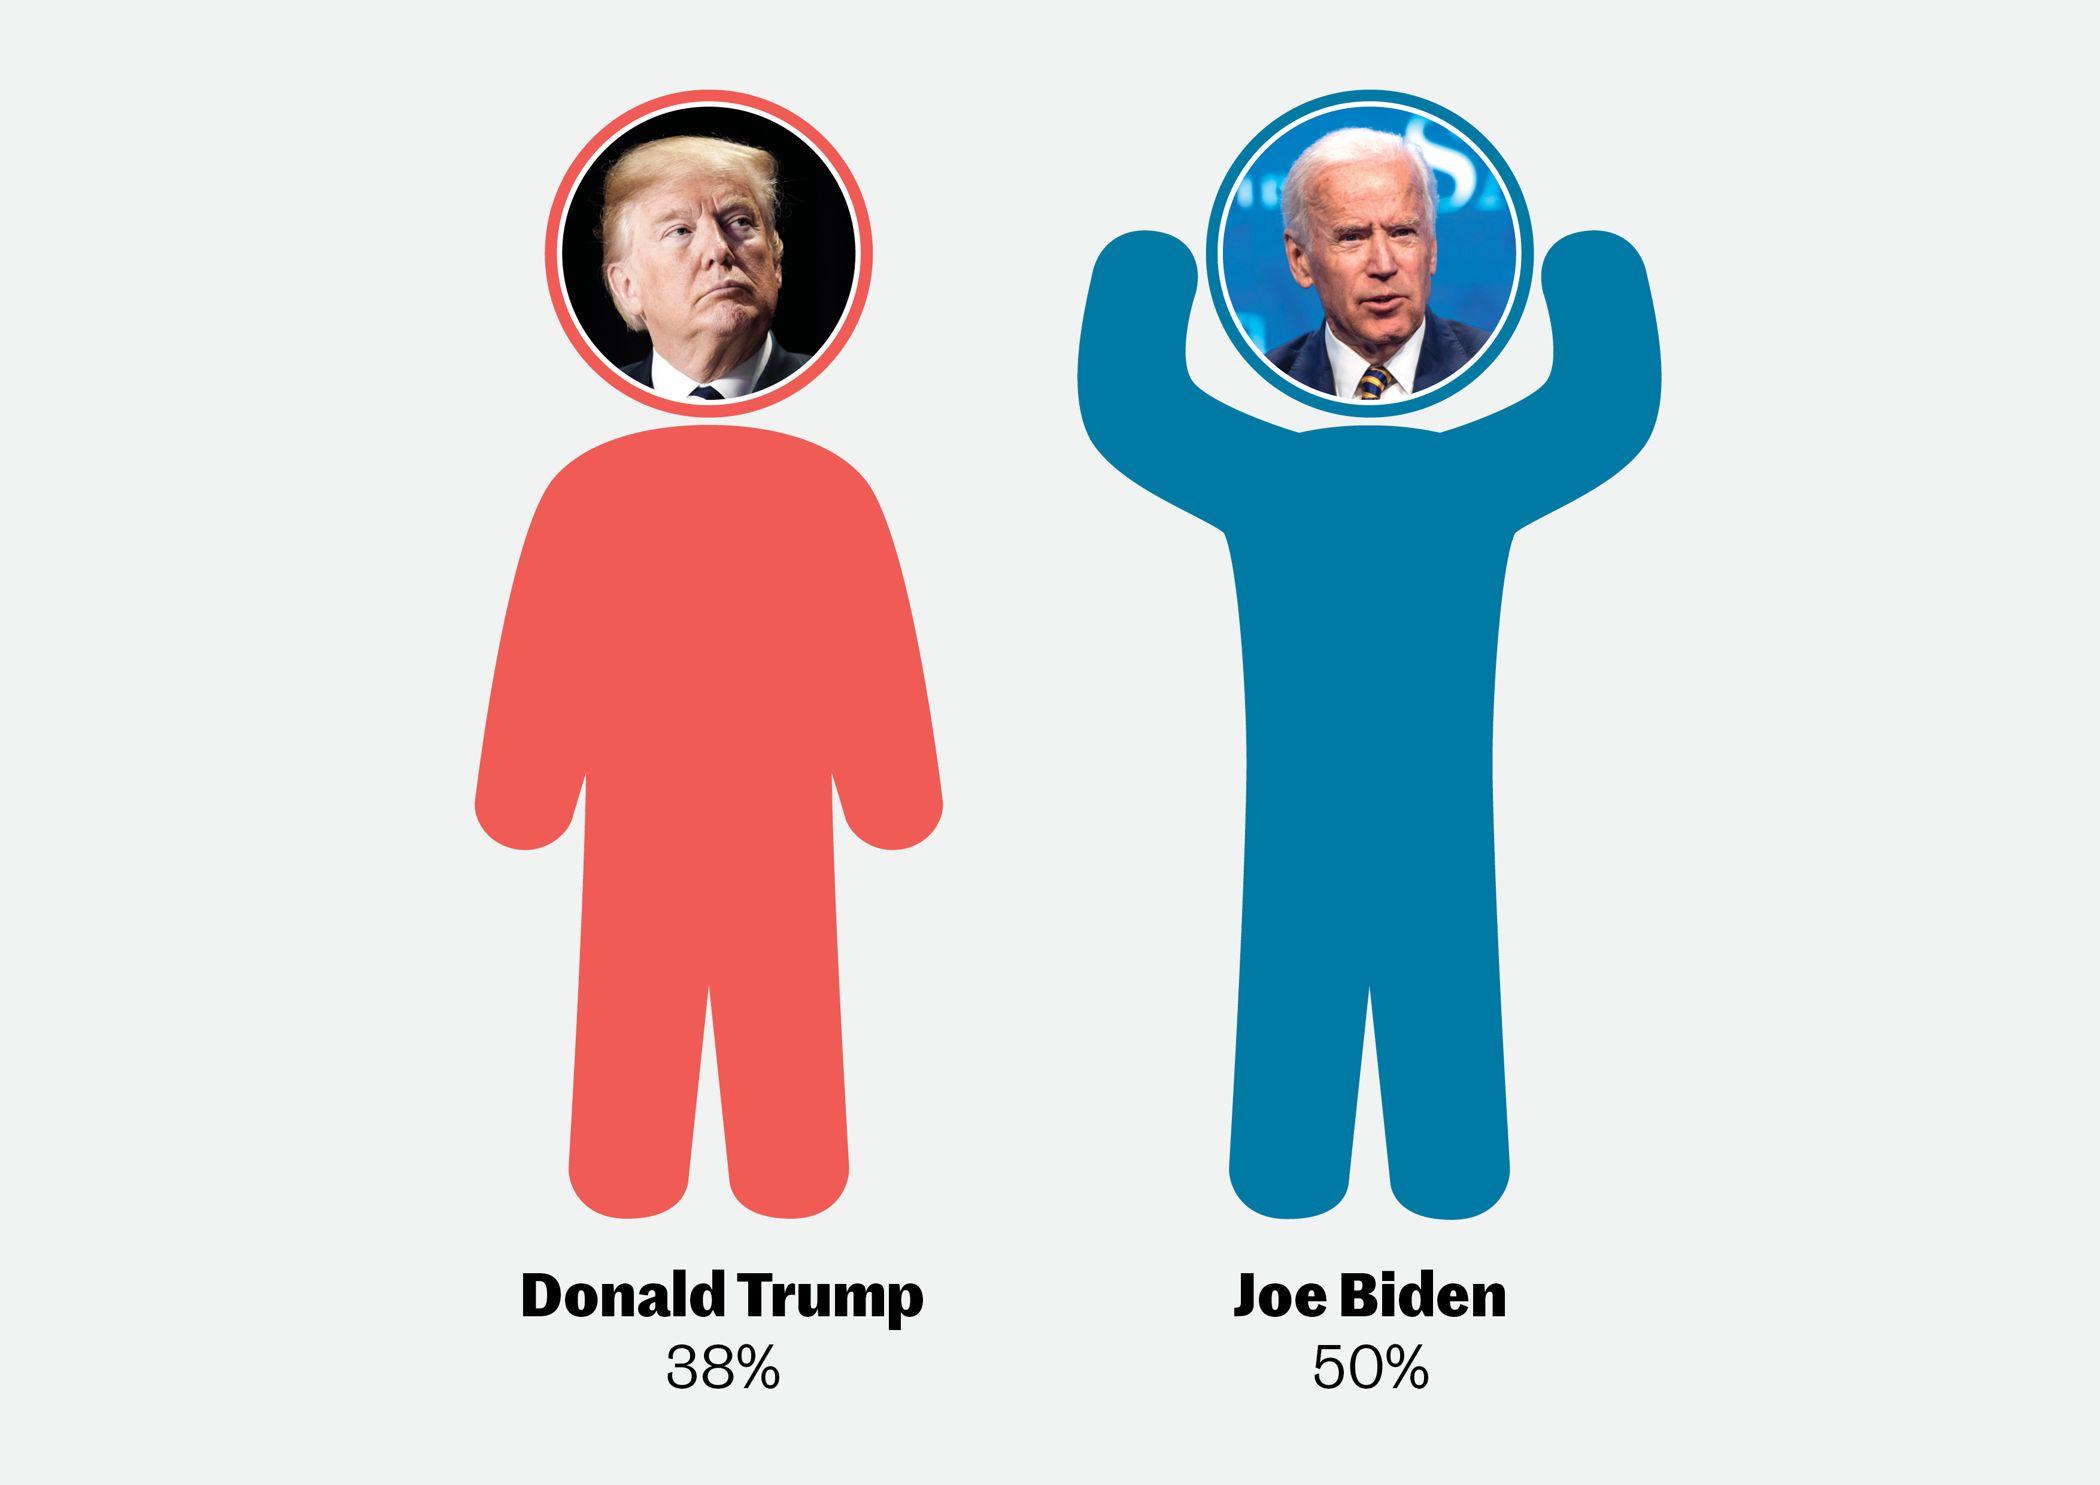 trump_vs_biden3.jpg